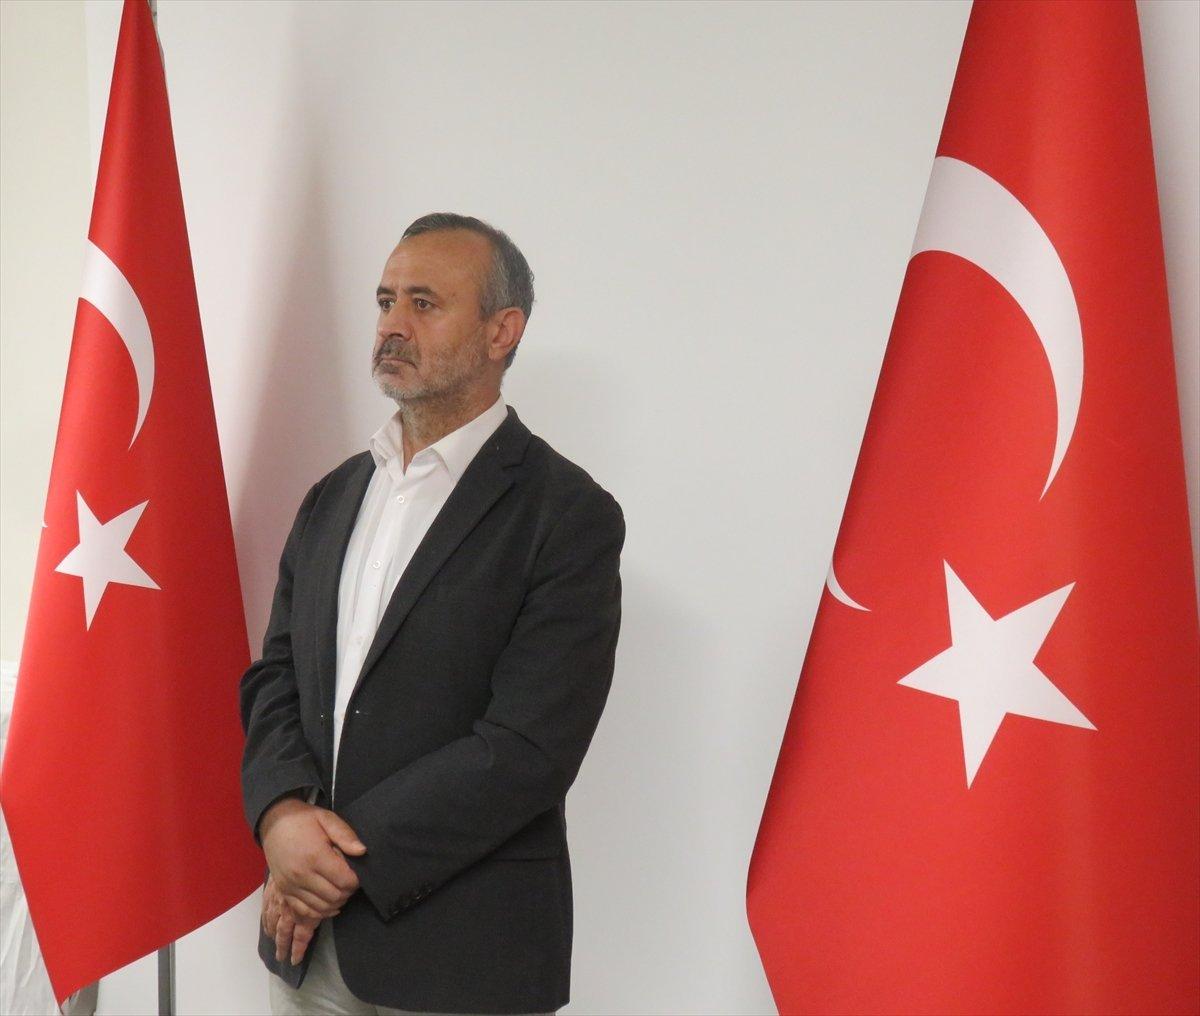 MİT tarafından yakalanan Orhan İnandı, Ankara Emniyet Müdürlüğü'ne teslim edildi #1